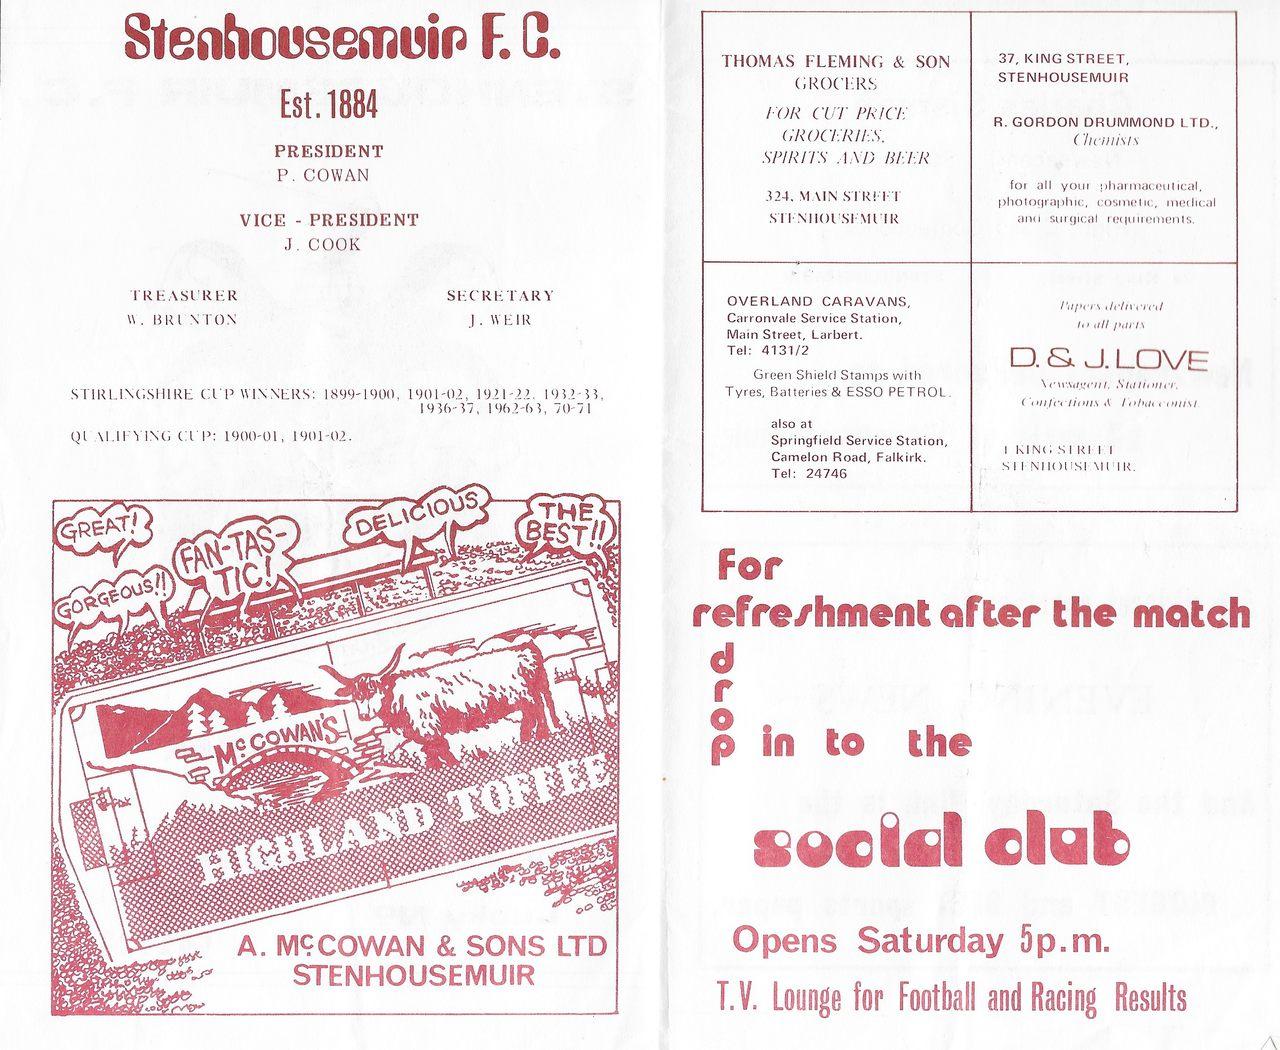 McCowan's and Stenhousemuir FC